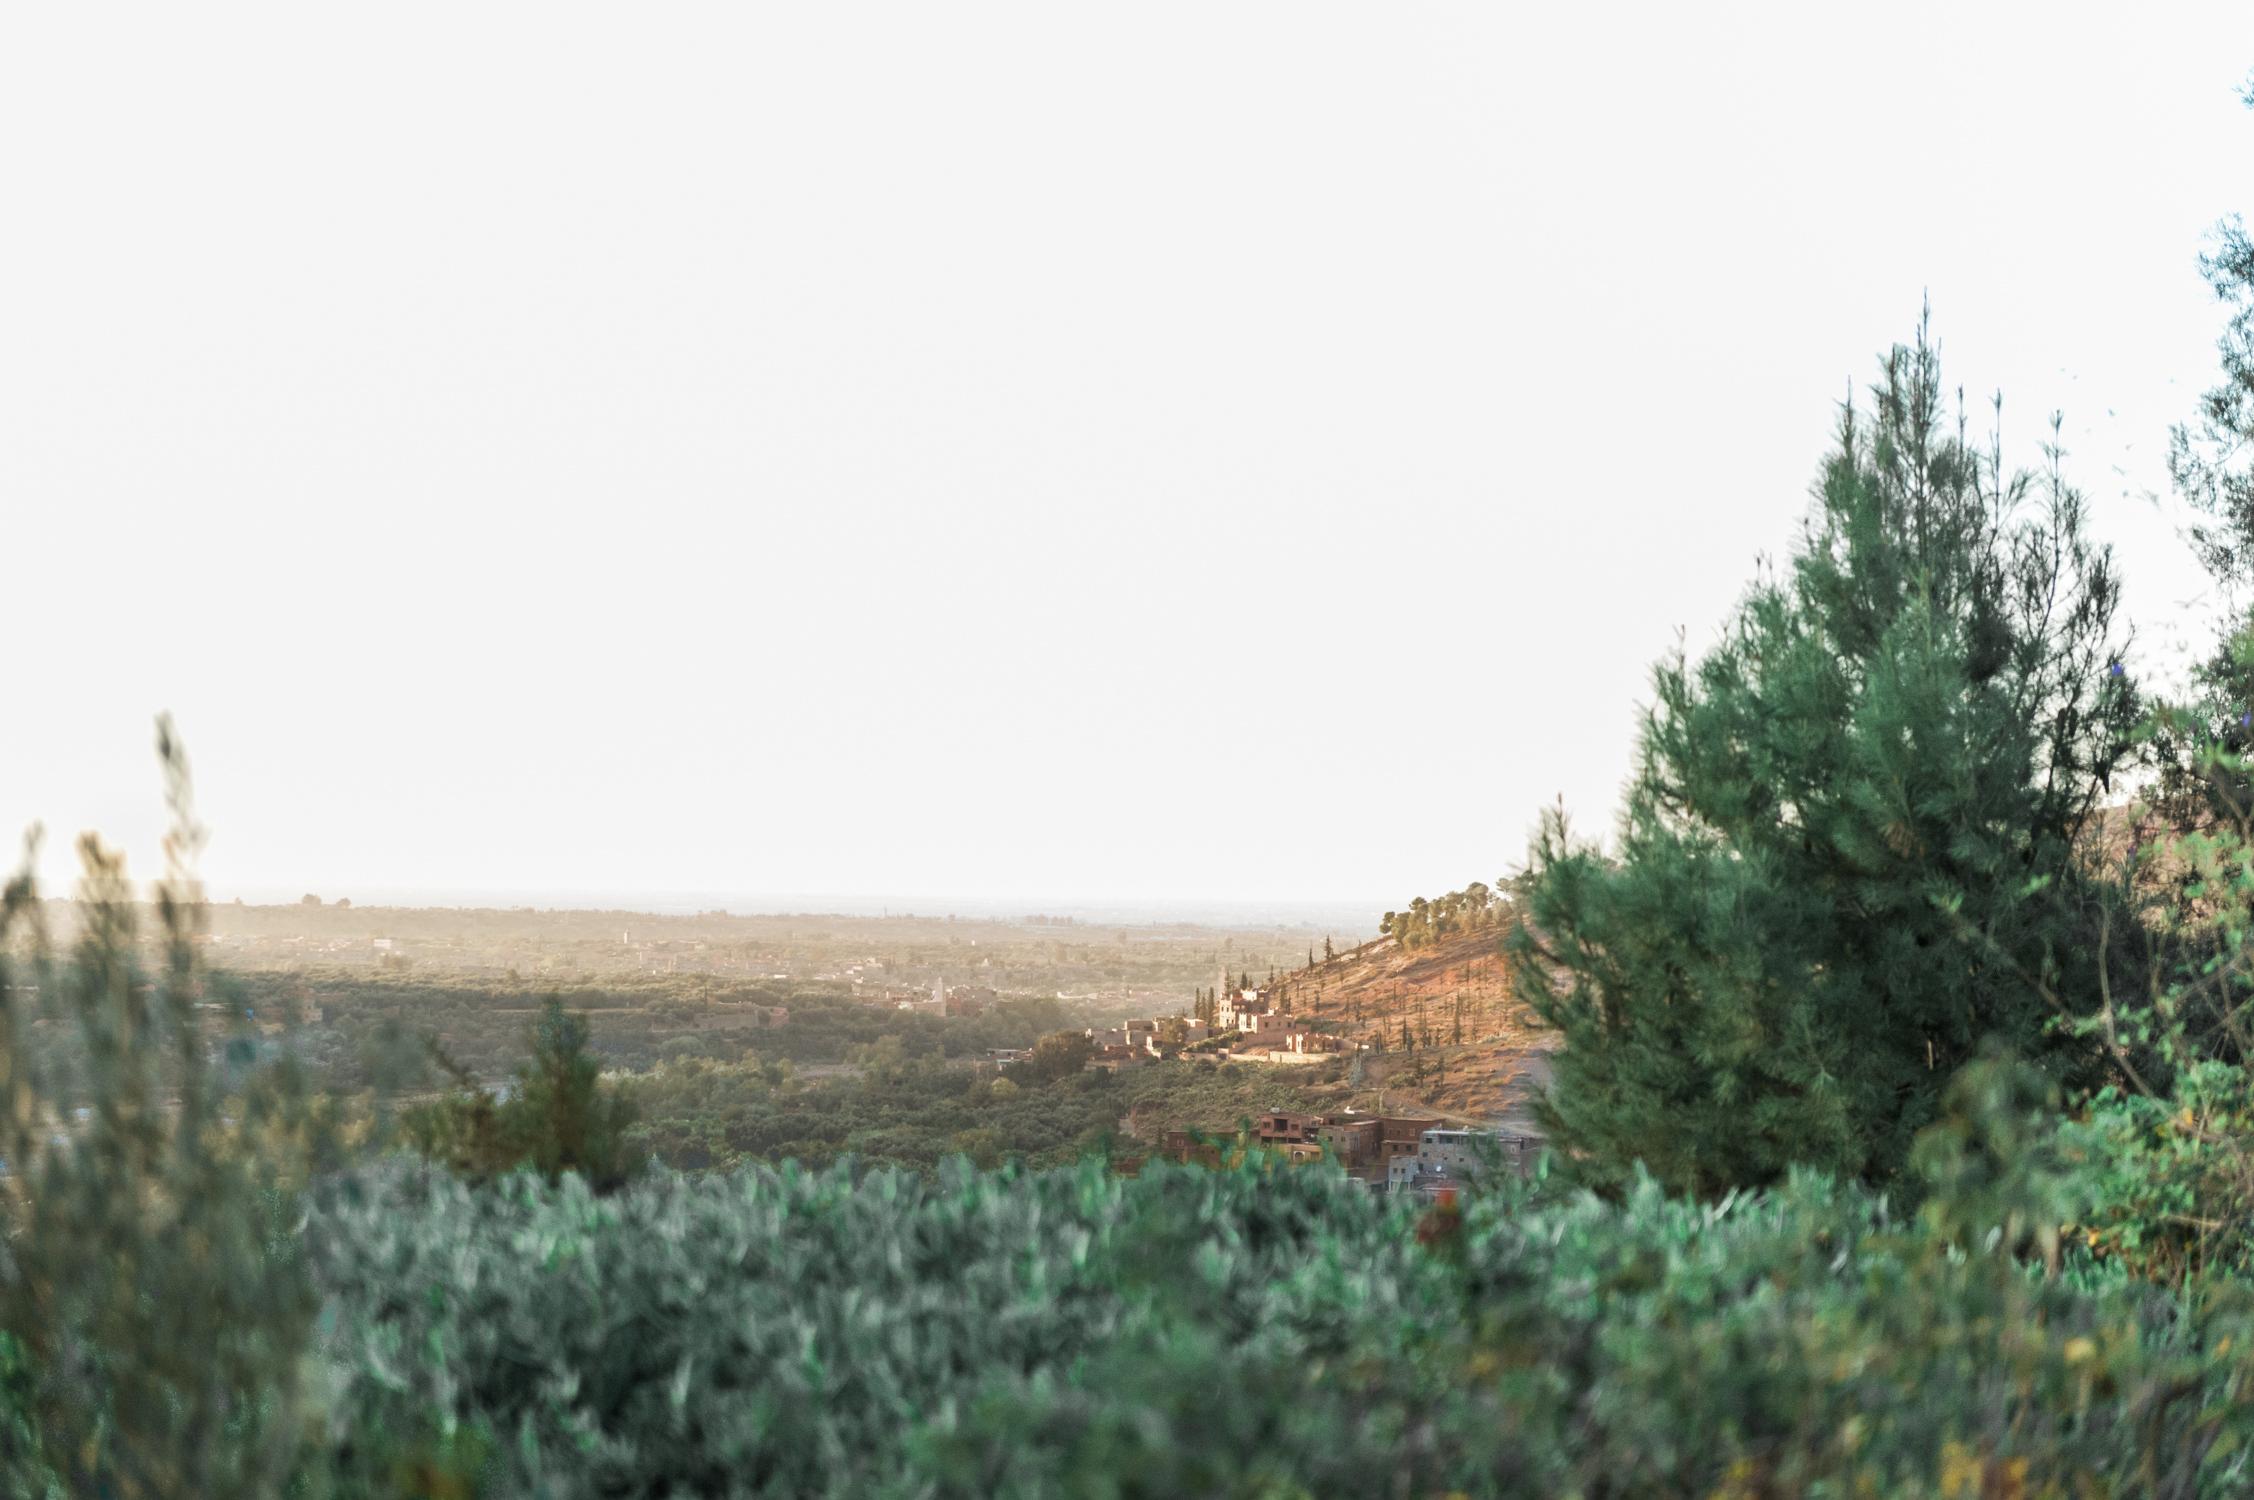 The view over Marrakech captured from Kasbah bap Ourika by an international award-winning wedding photographer